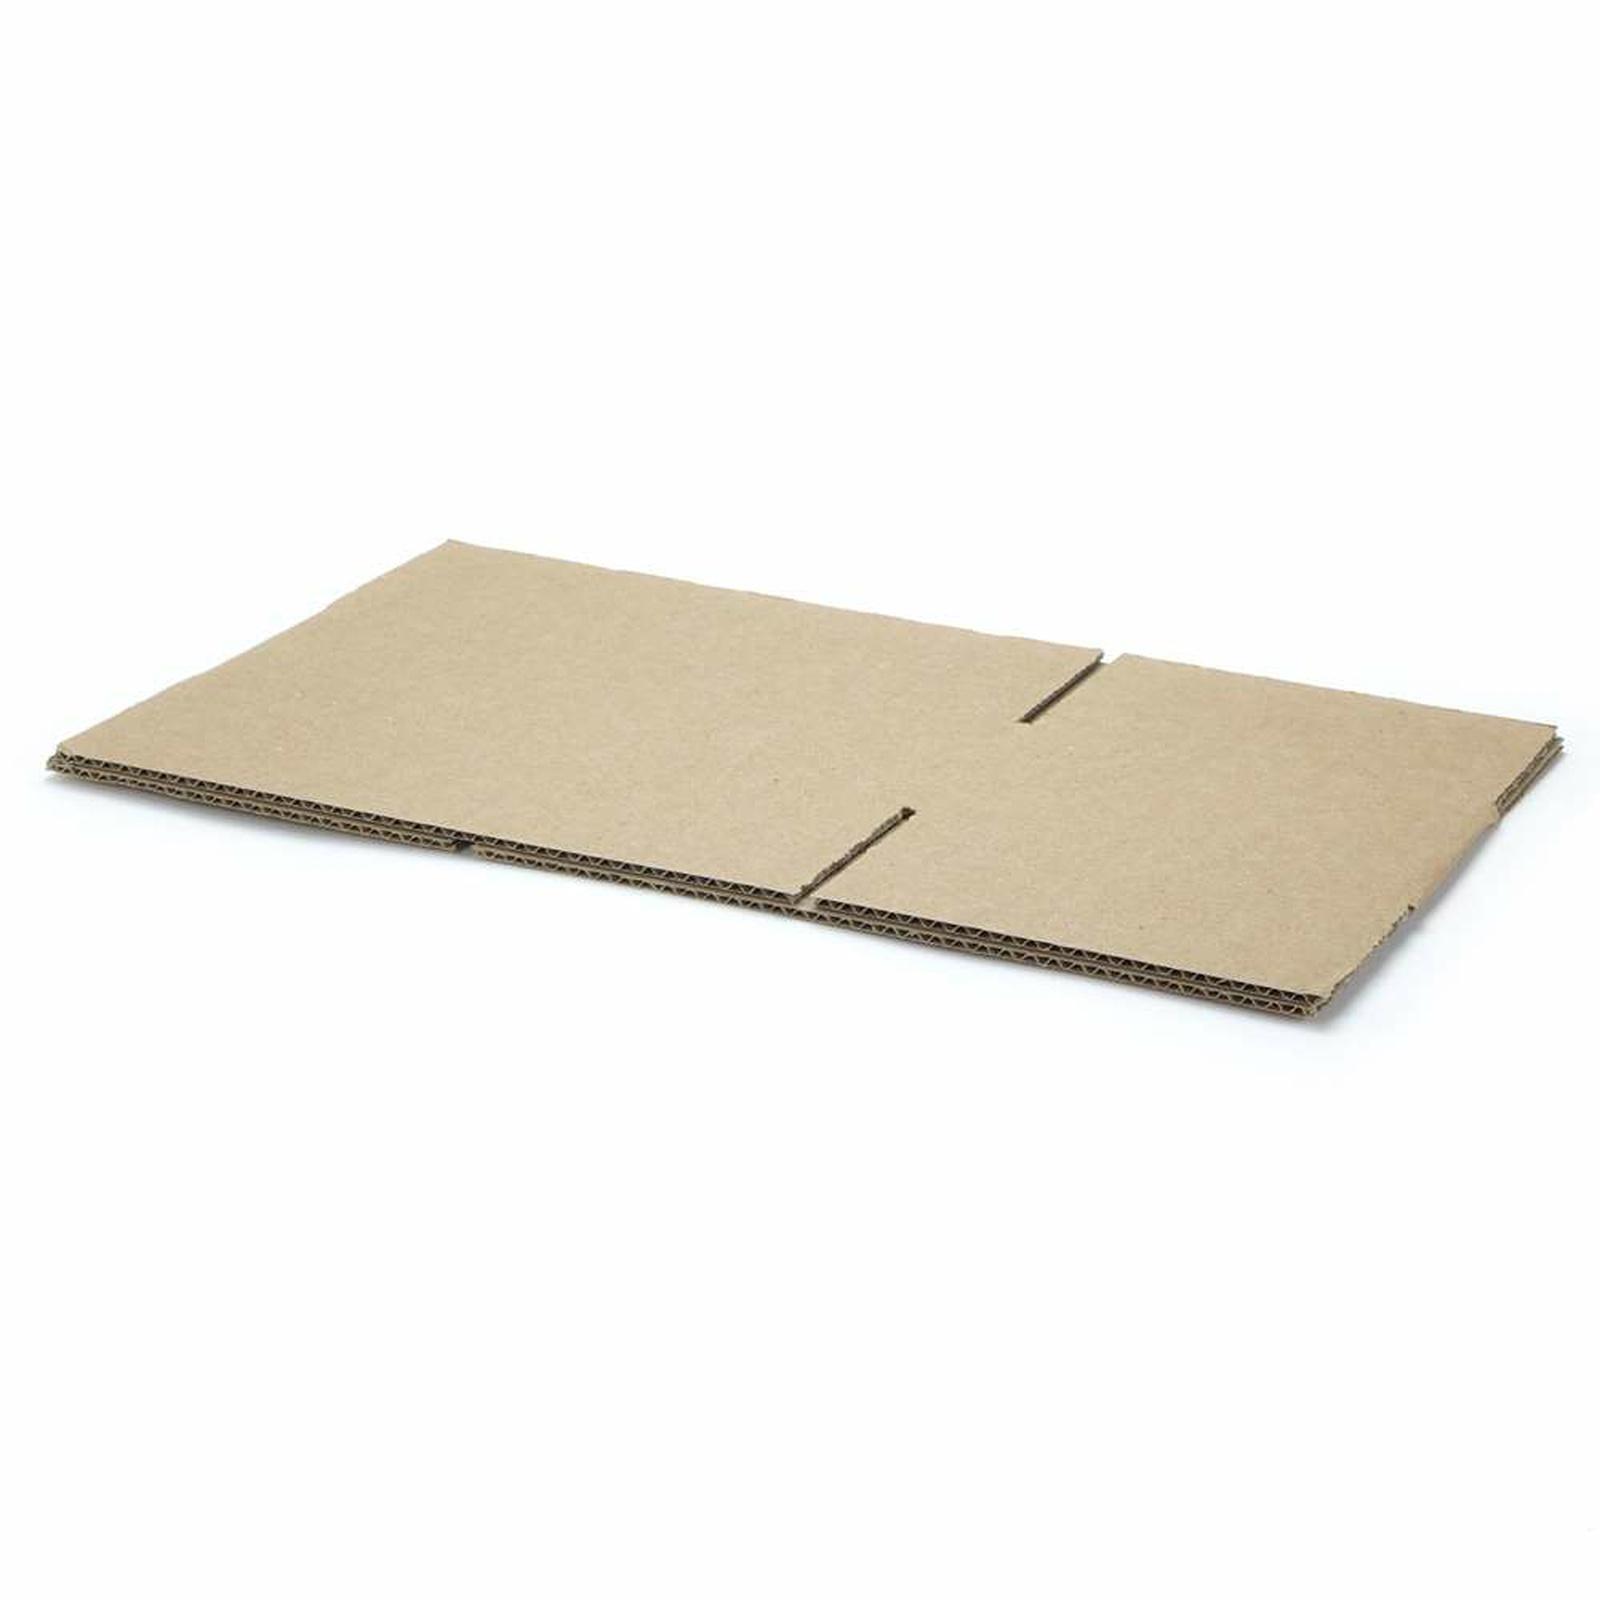 einwellige kartons 240x140x75 mm g nstig kaufen 0 15. Black Bedroom Furniture Sets. Home Design Ideas